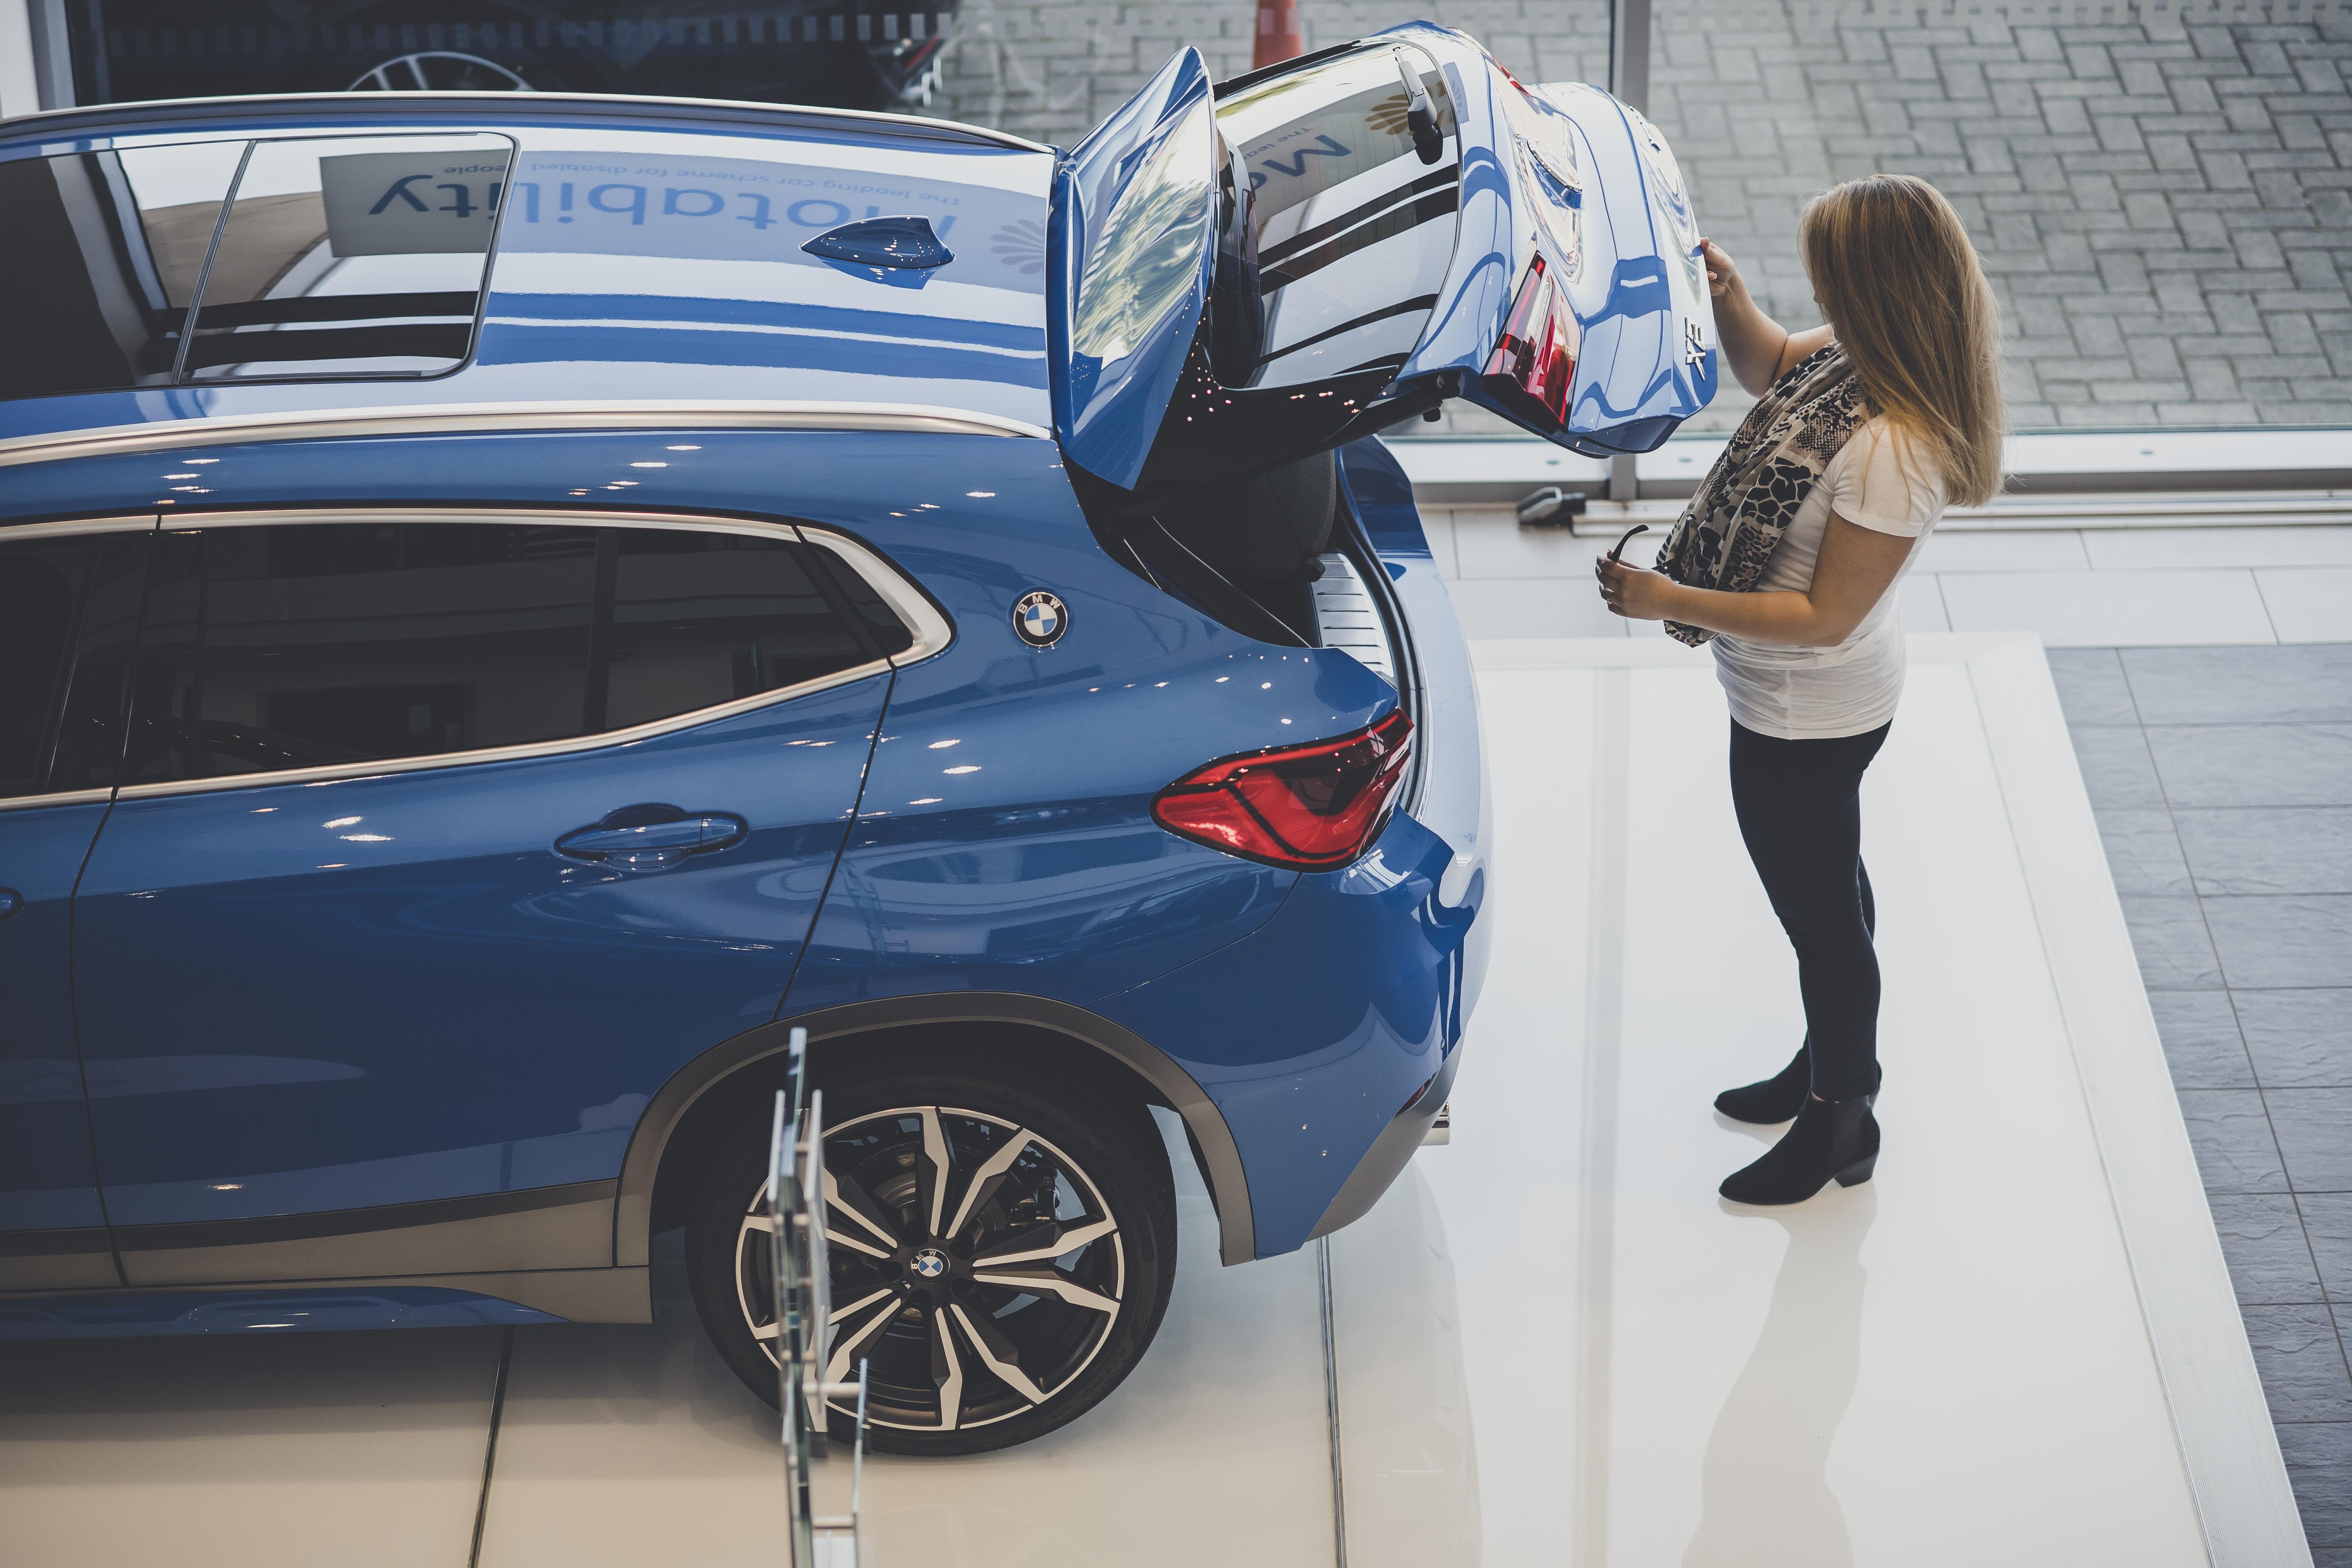 A women surveys a car at an Auto Trader show room